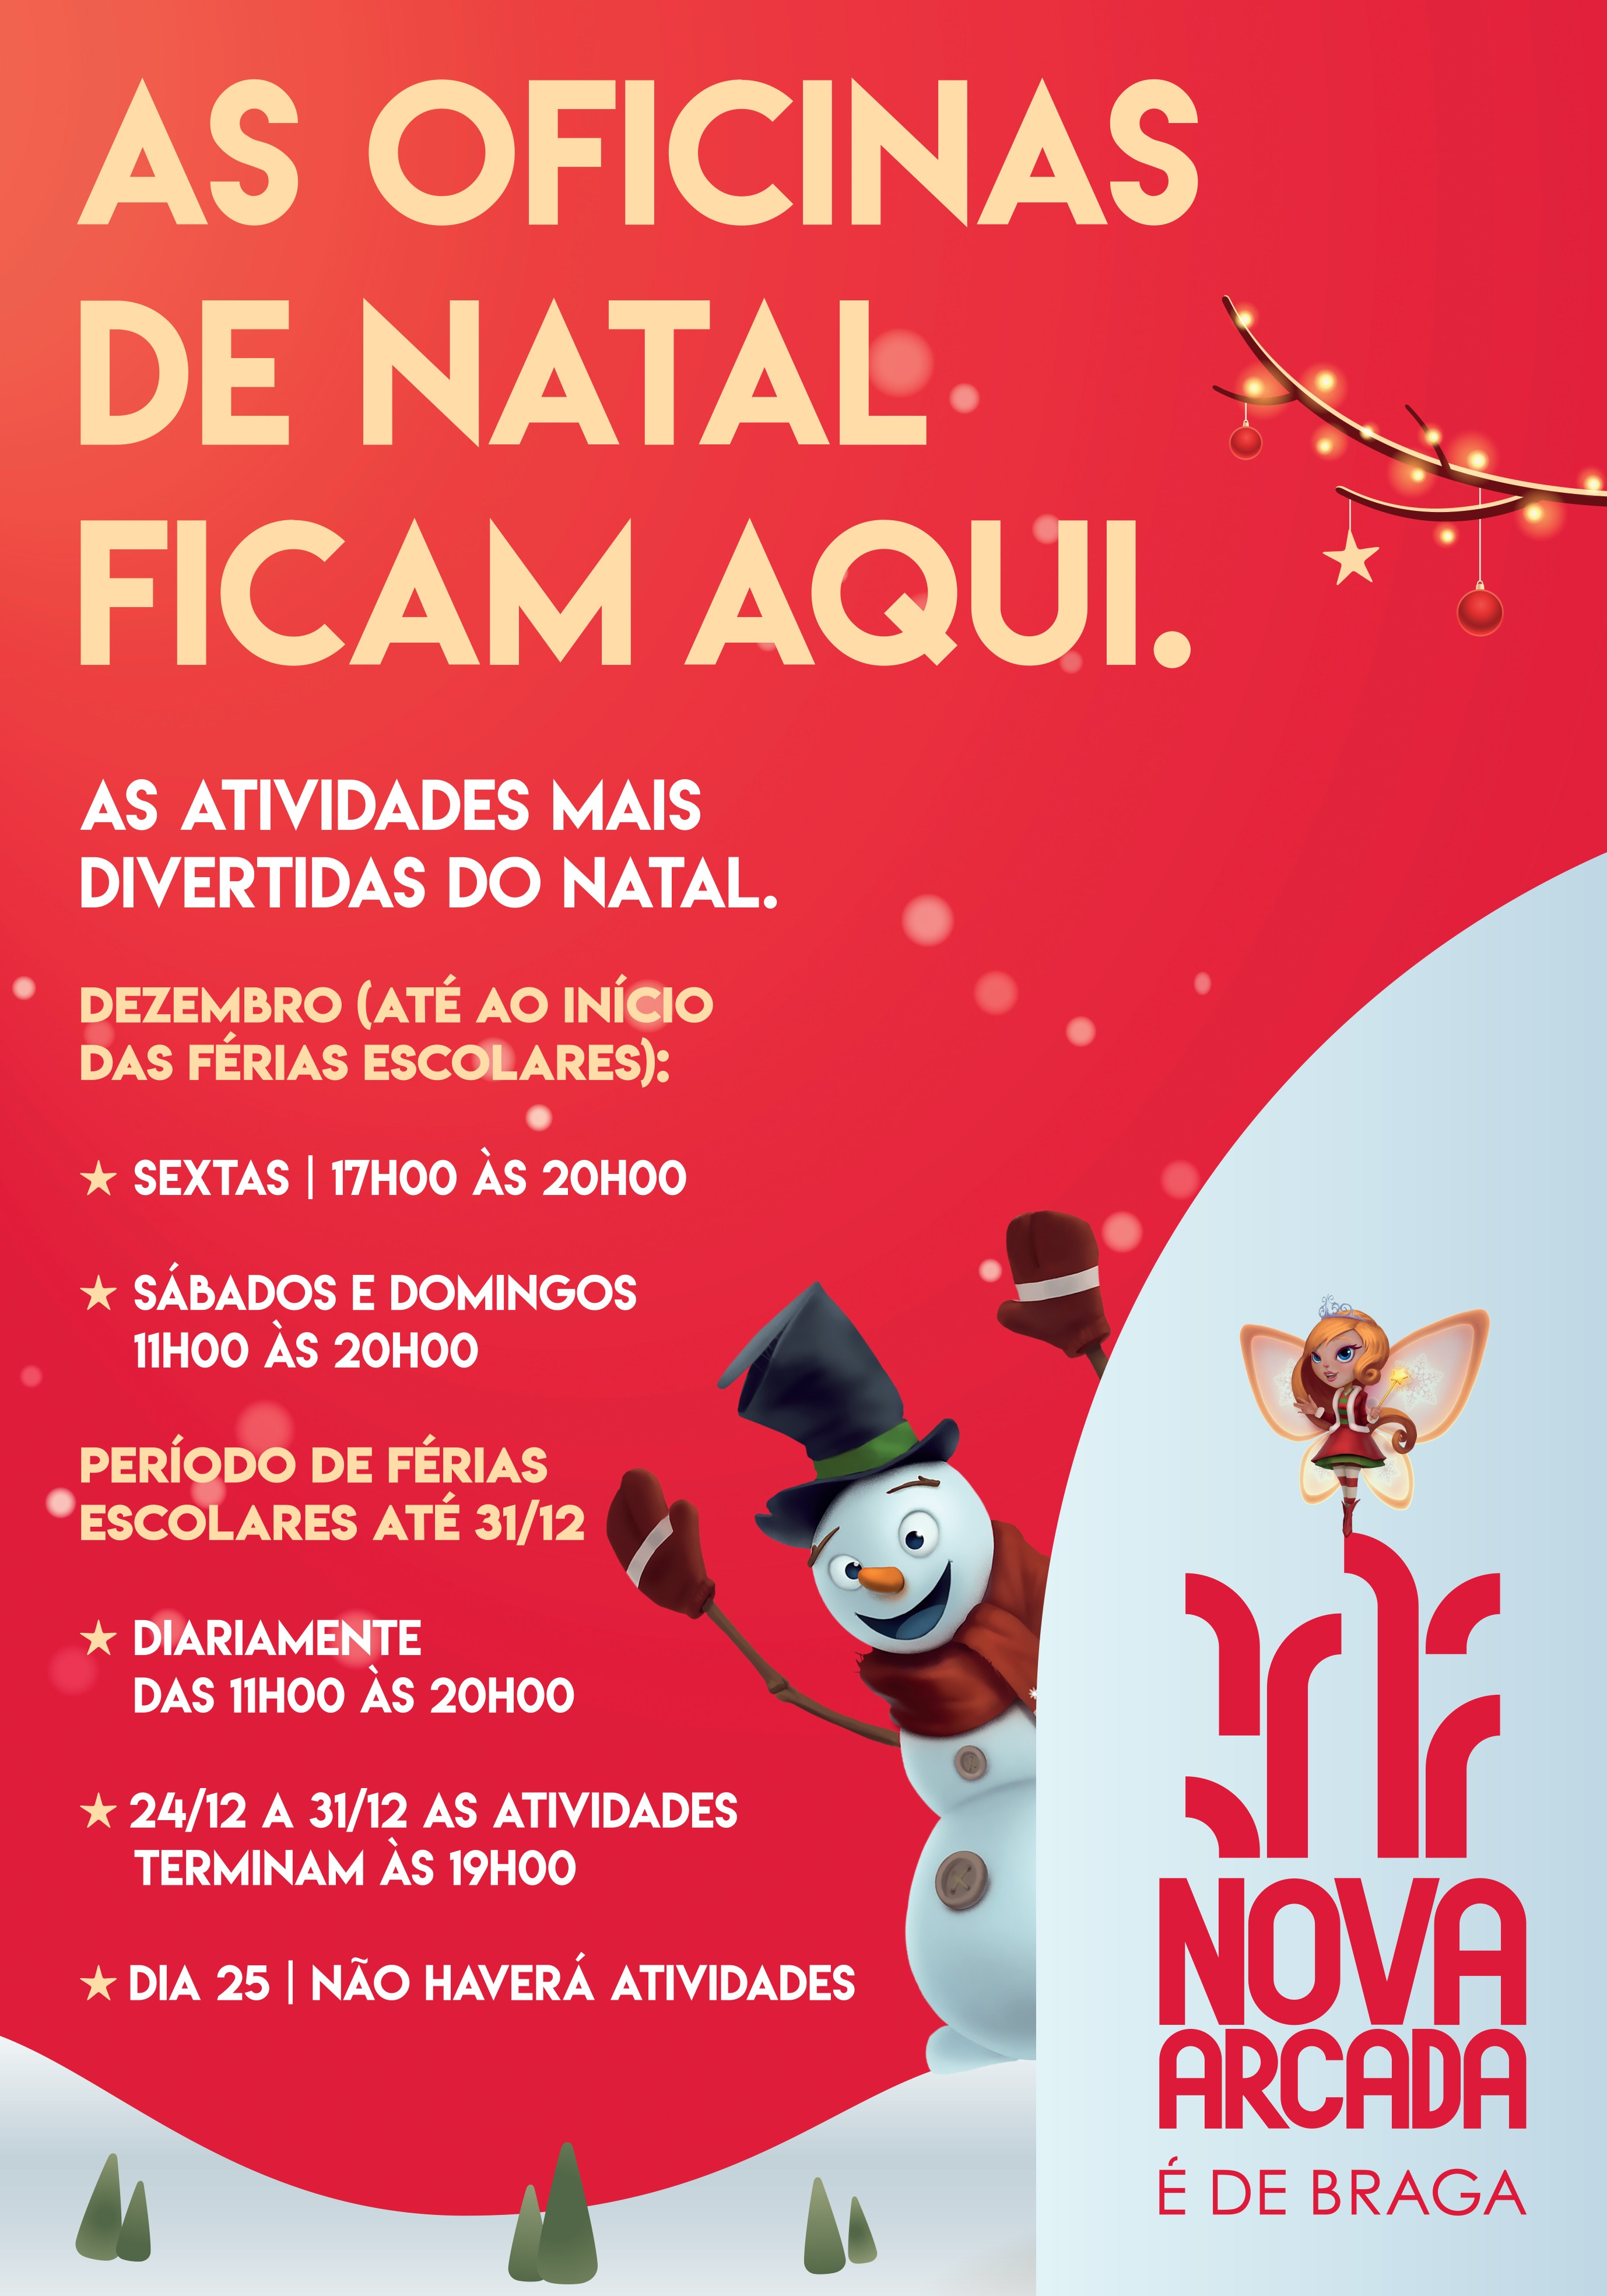 AFm_NA_Natal_Oficinas_700x1000_cv